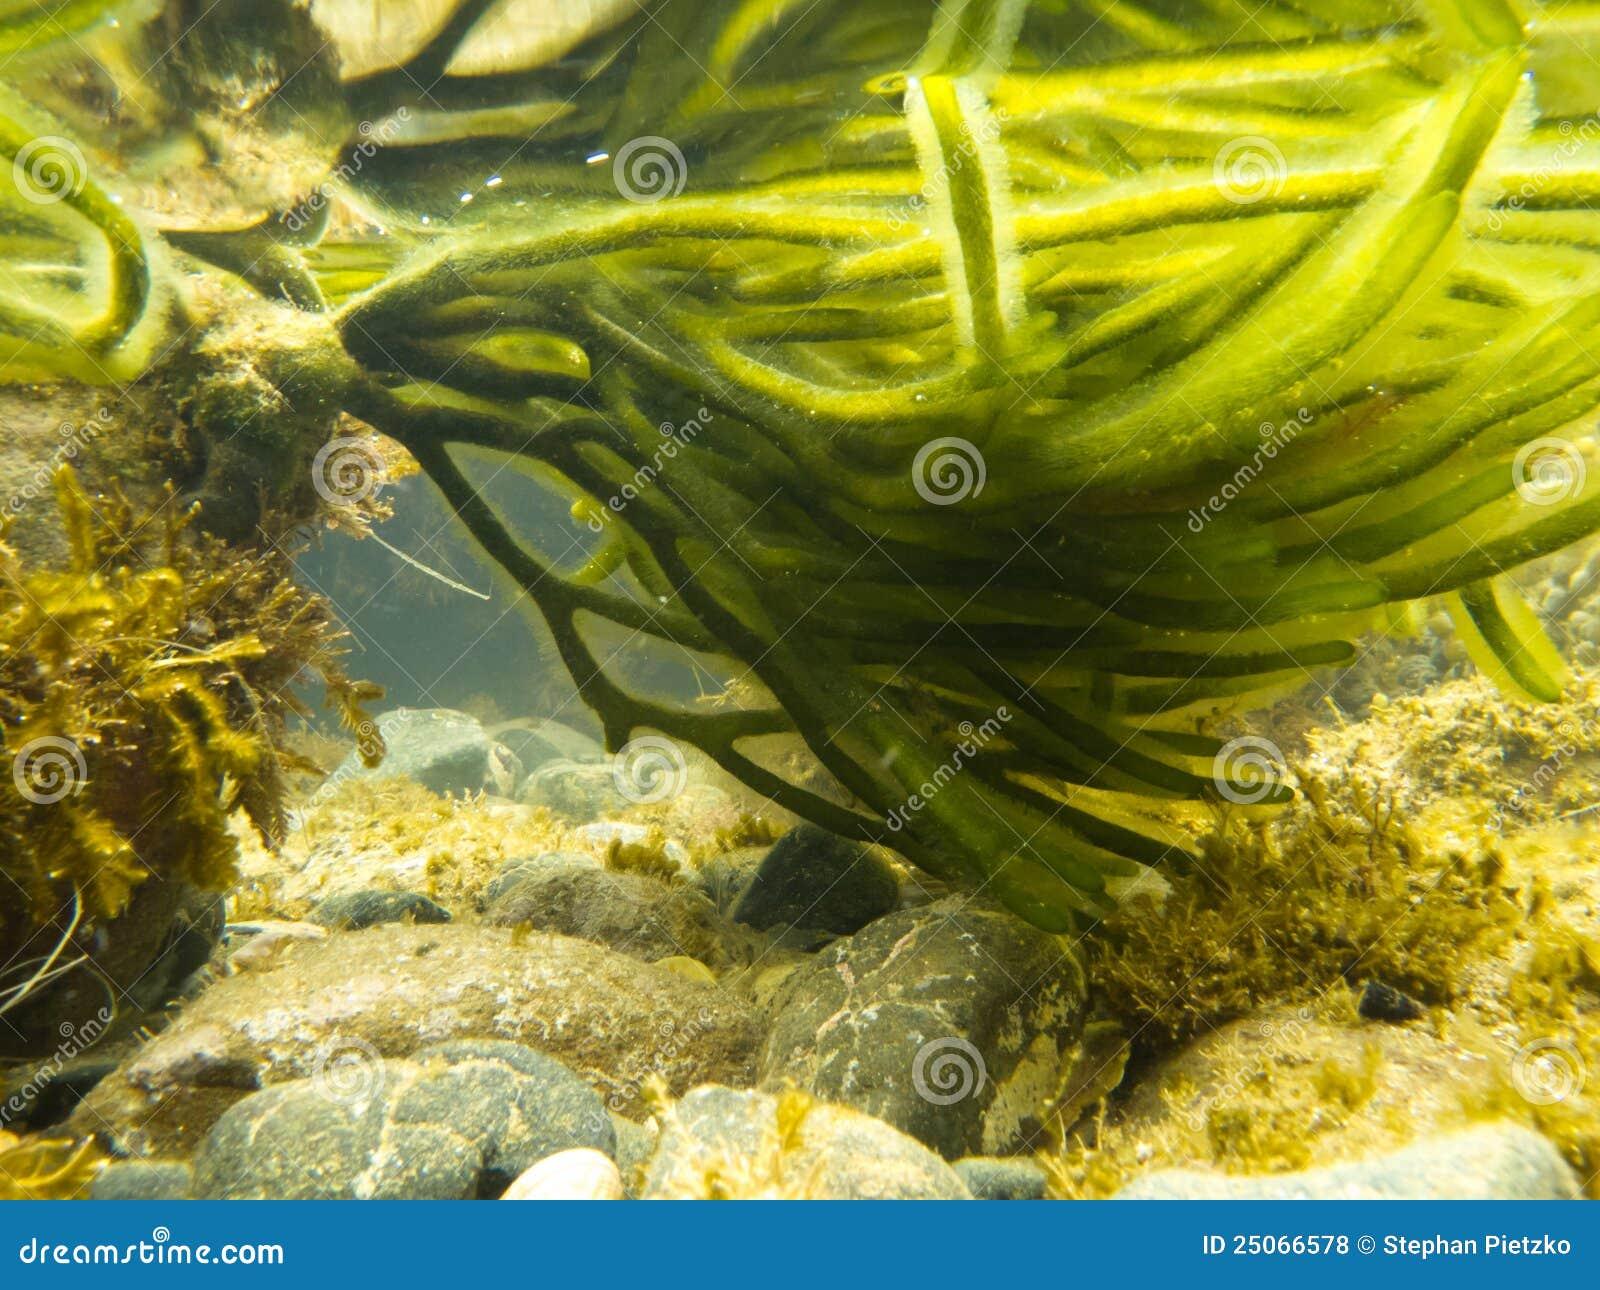 underwater shot of green seaweed attached to rock royalty seaweed vector download seaweed vector background